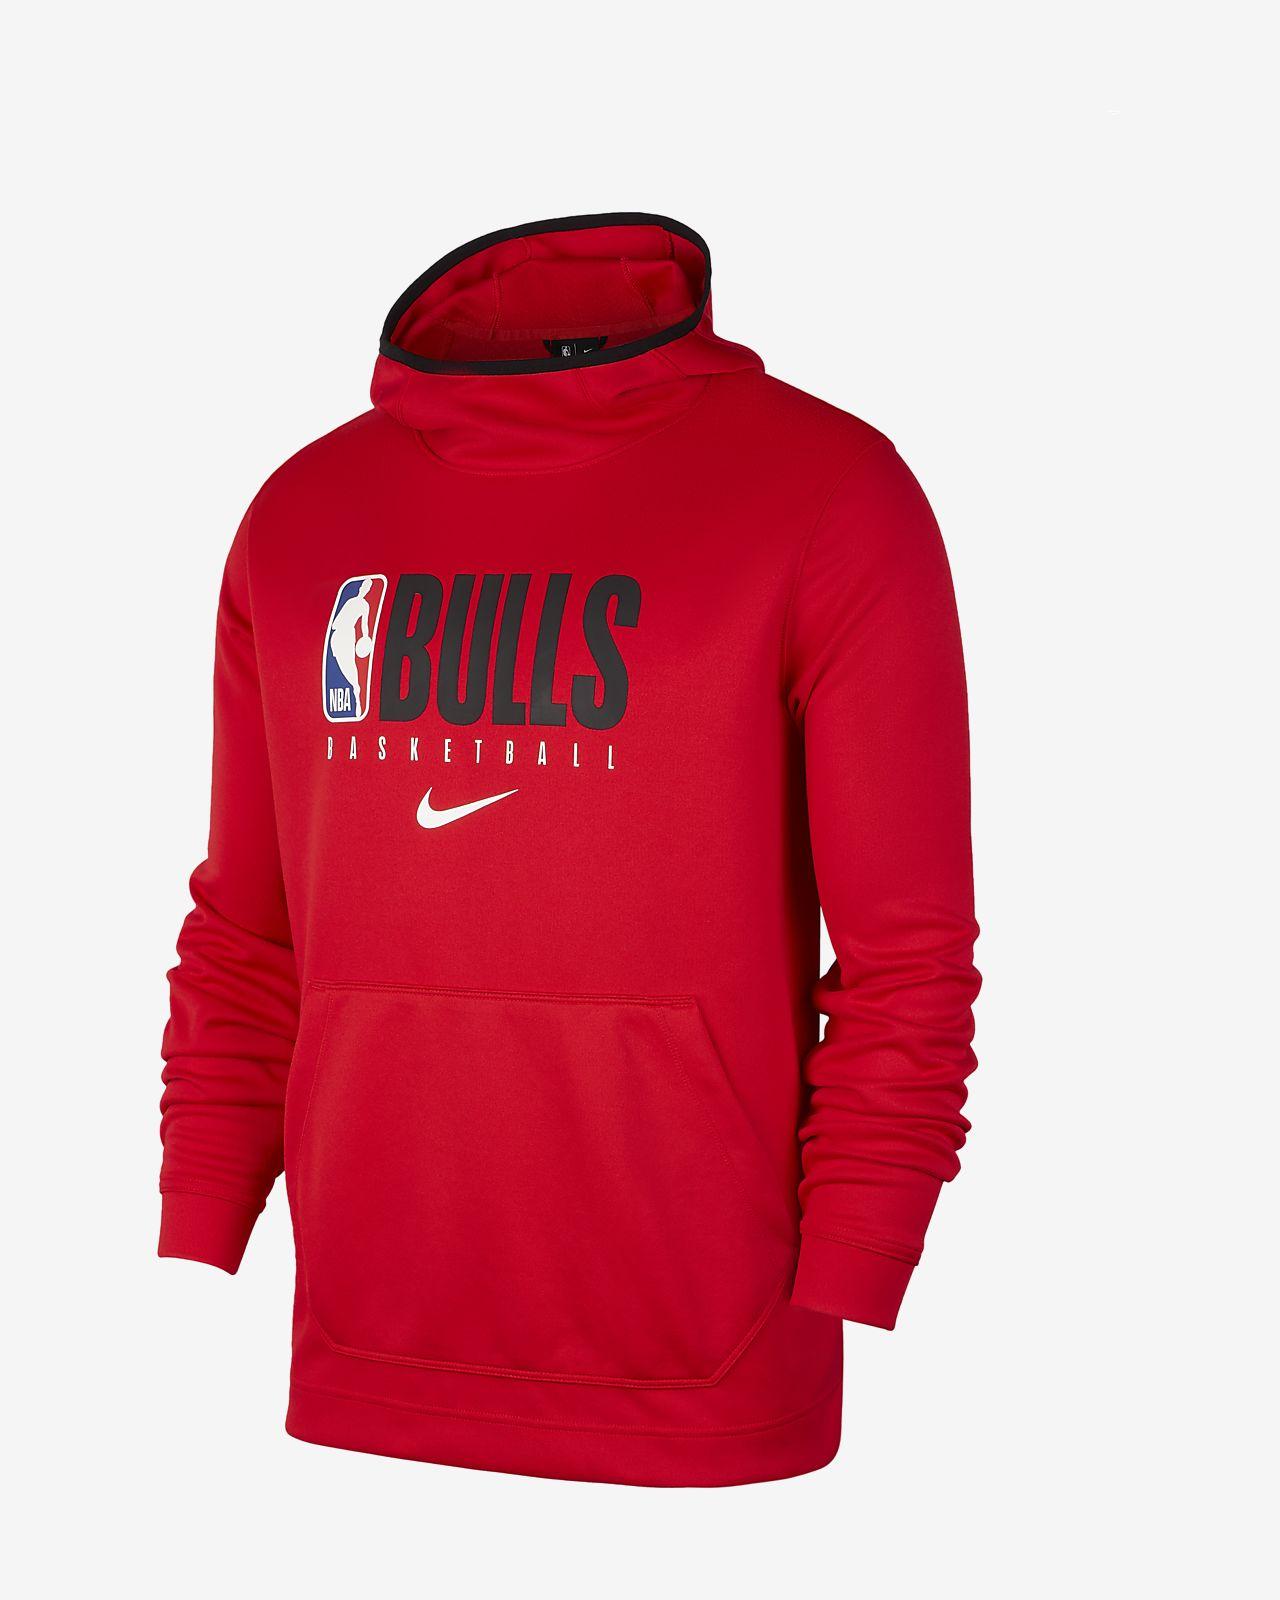 Sudadera con capucha de la NBA para hombre Chicago Bulls Nike Spotlight